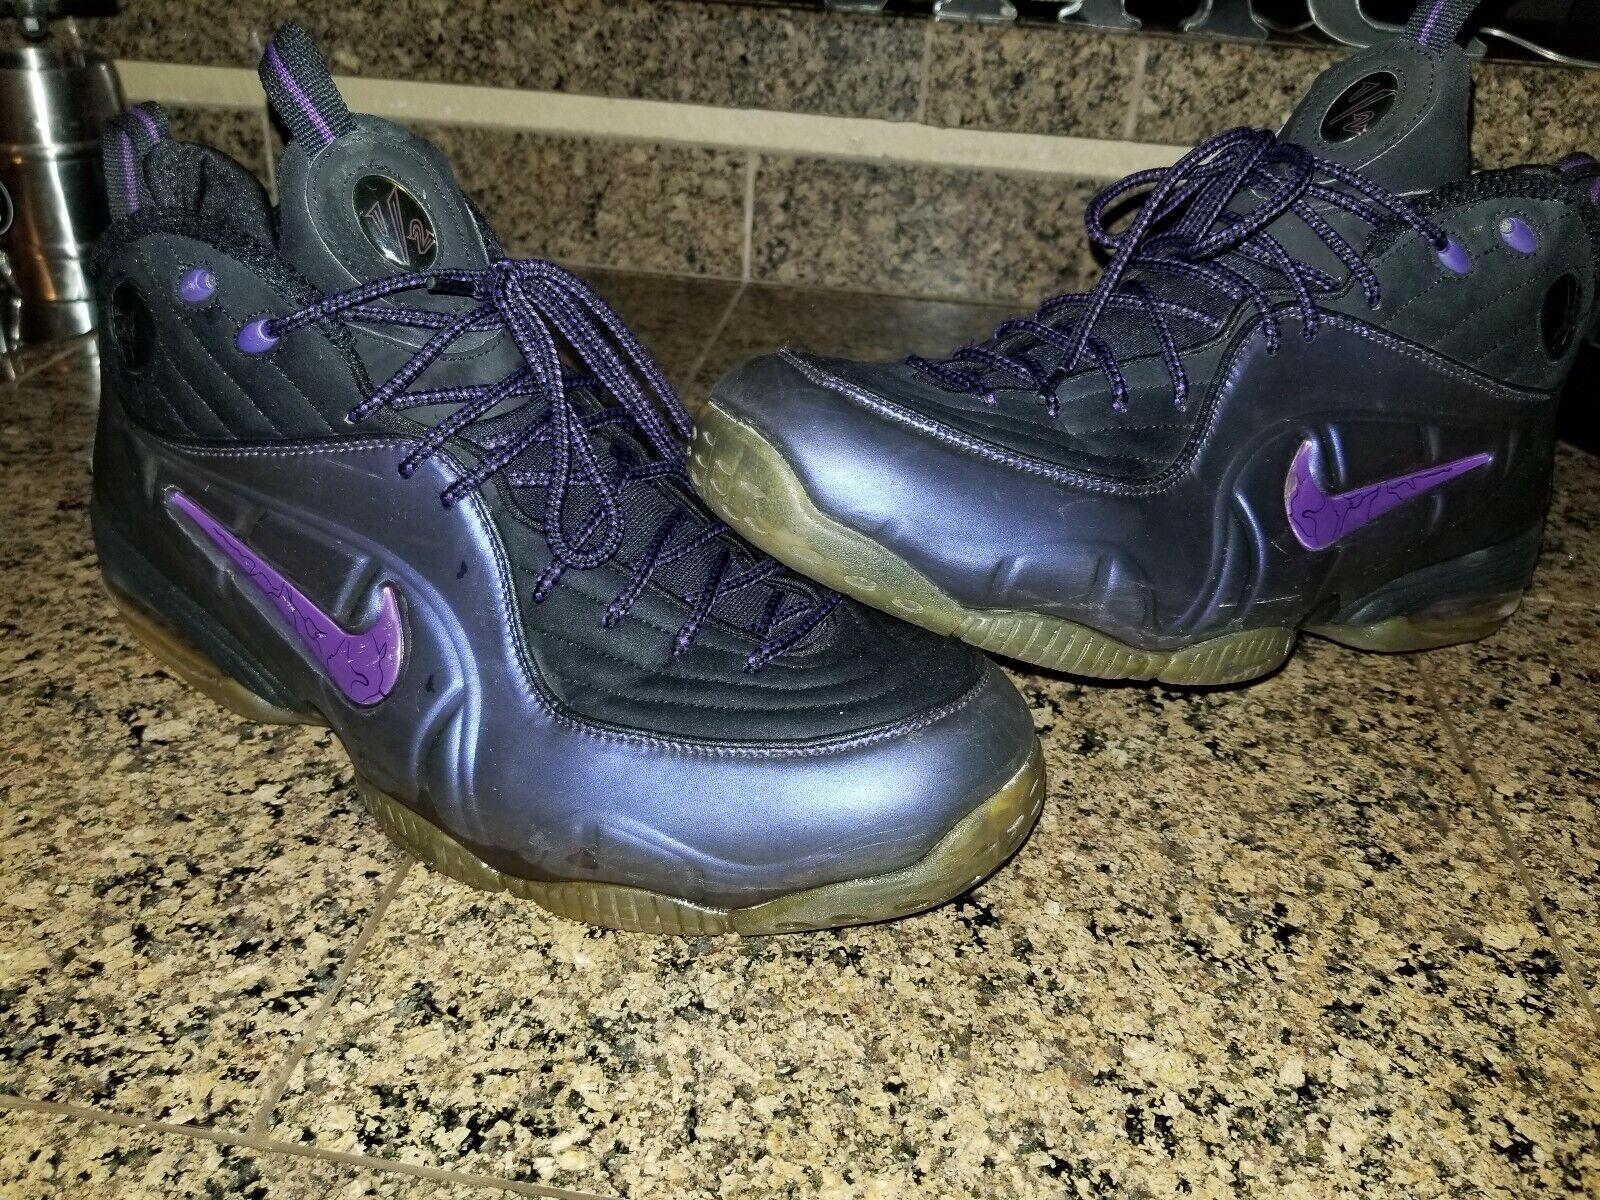 5833f54b04 Nike Air Penny Half Cent 13 (344646 500) Eggplant Purple 2 Size 1 ...